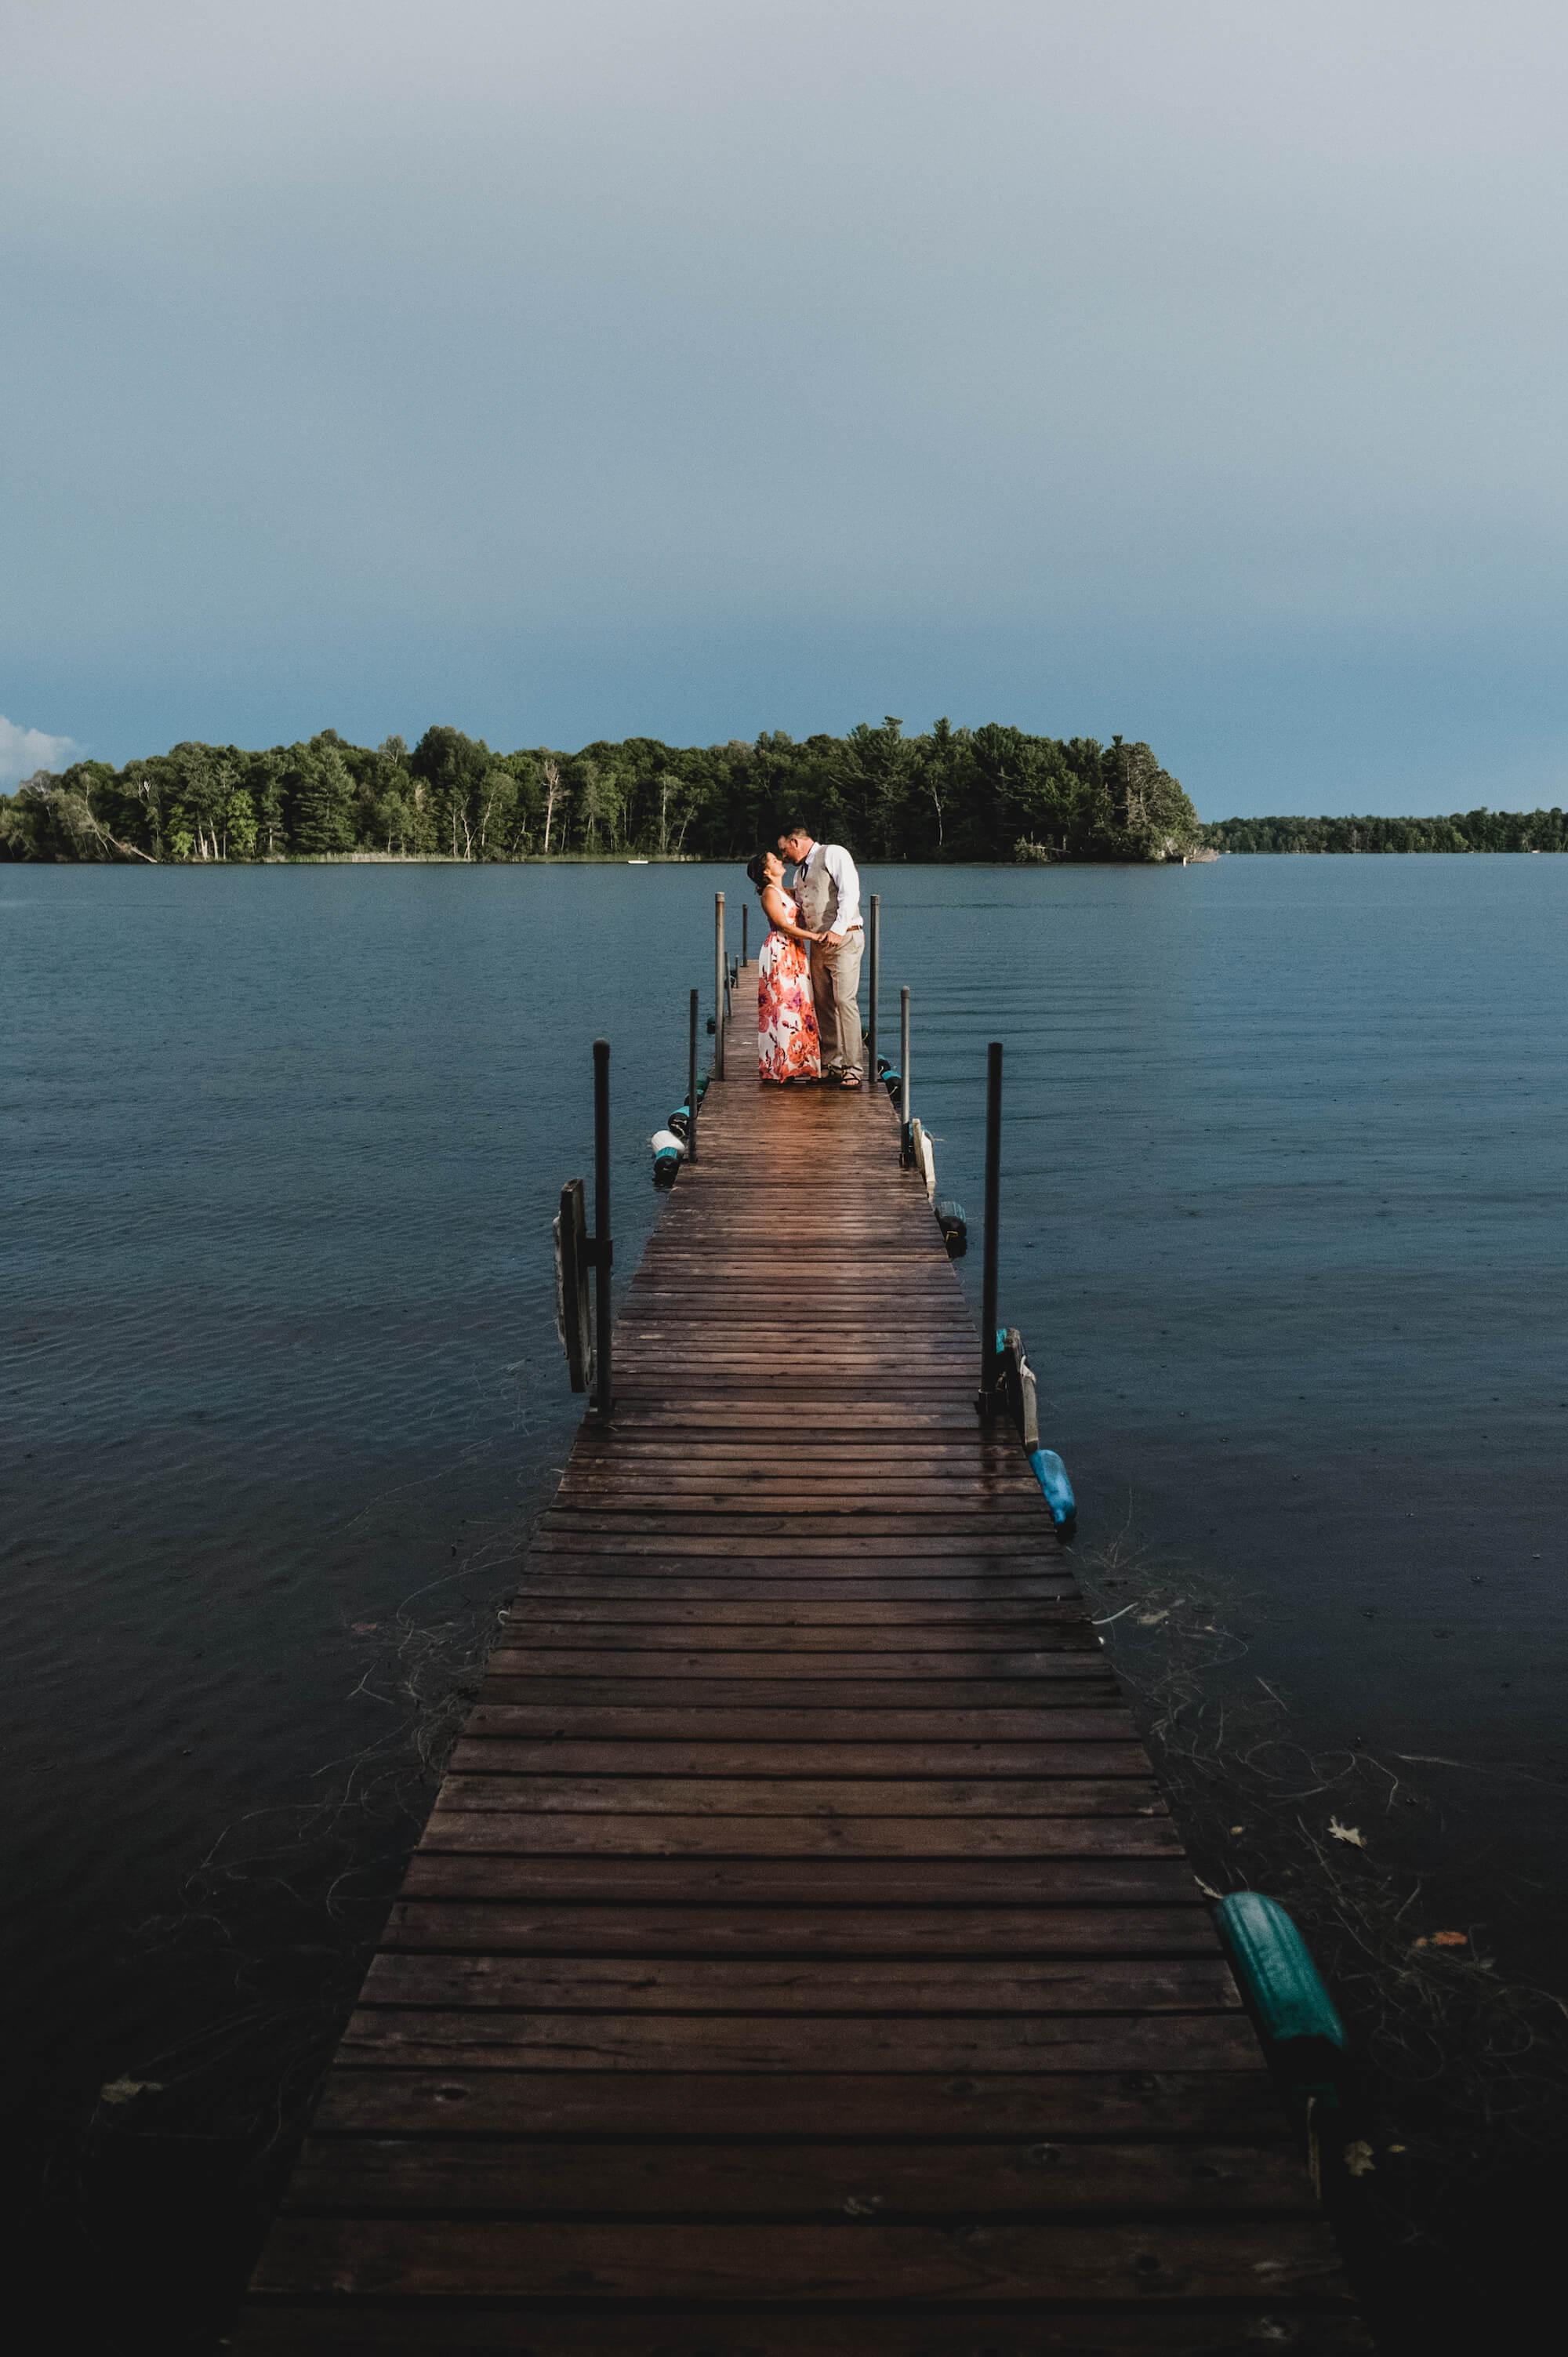 engle-olson-maddy-pat-mn-wedding-photography-52.jpg